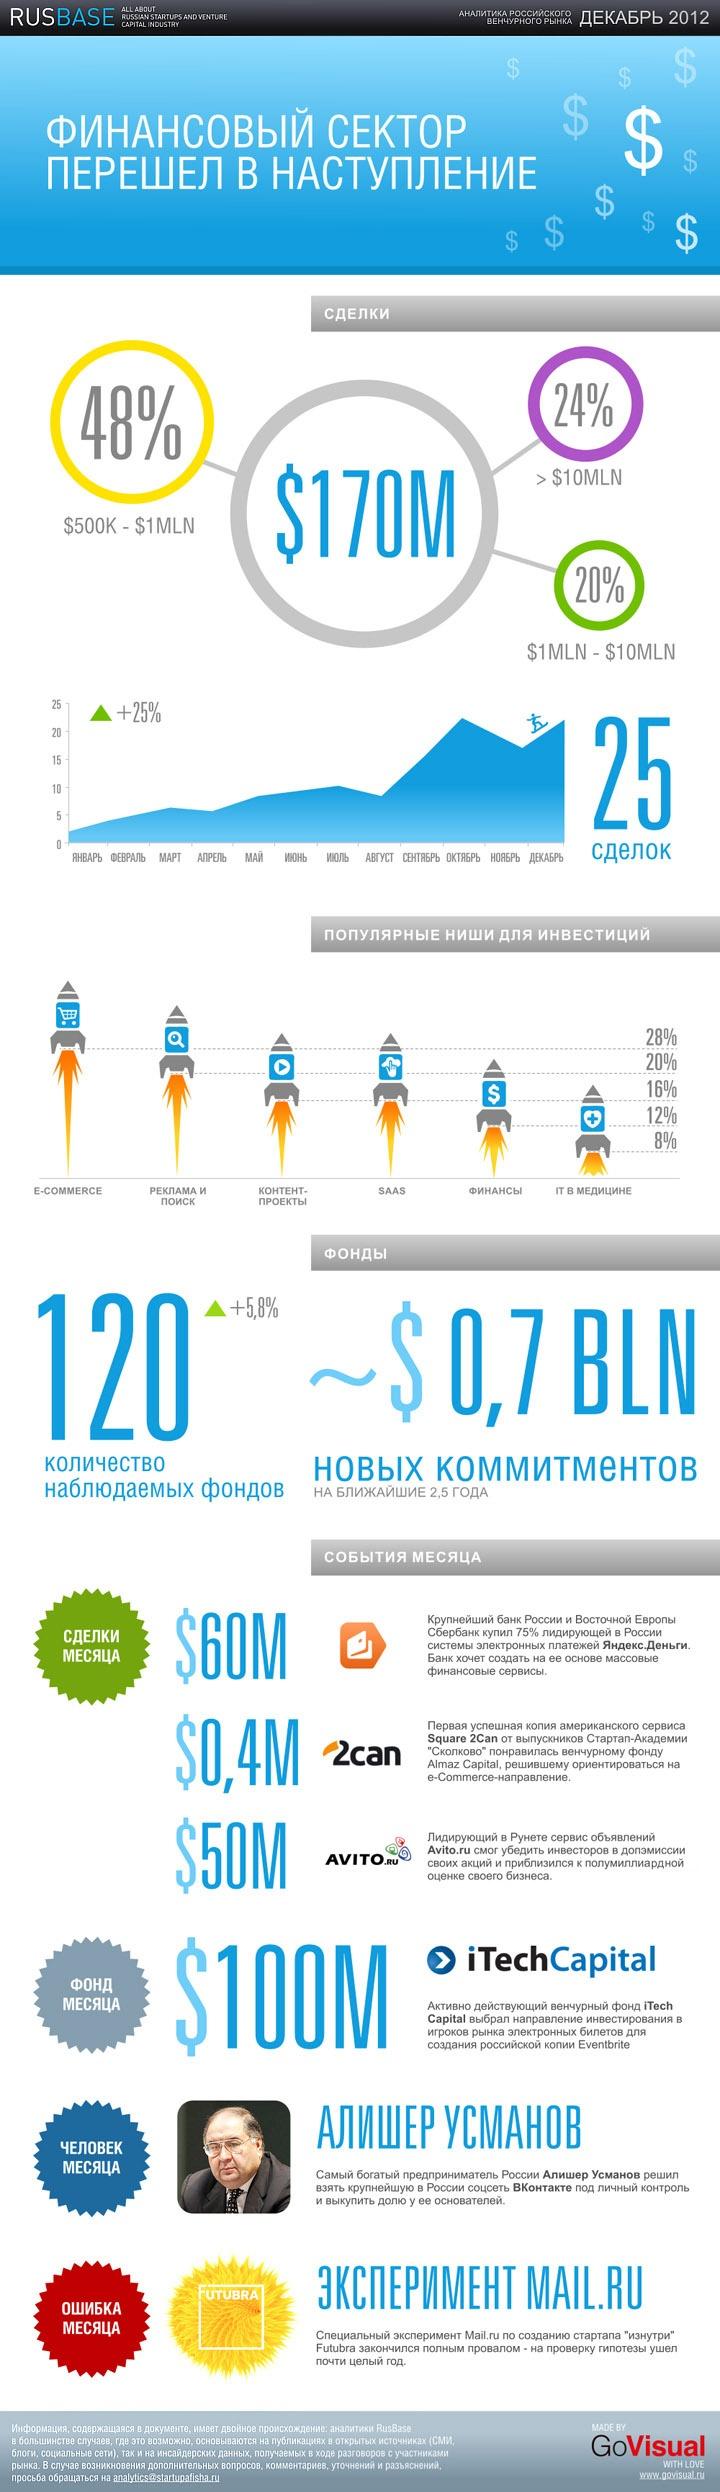 аналитика российского венчурного рынка за декабрь 2012